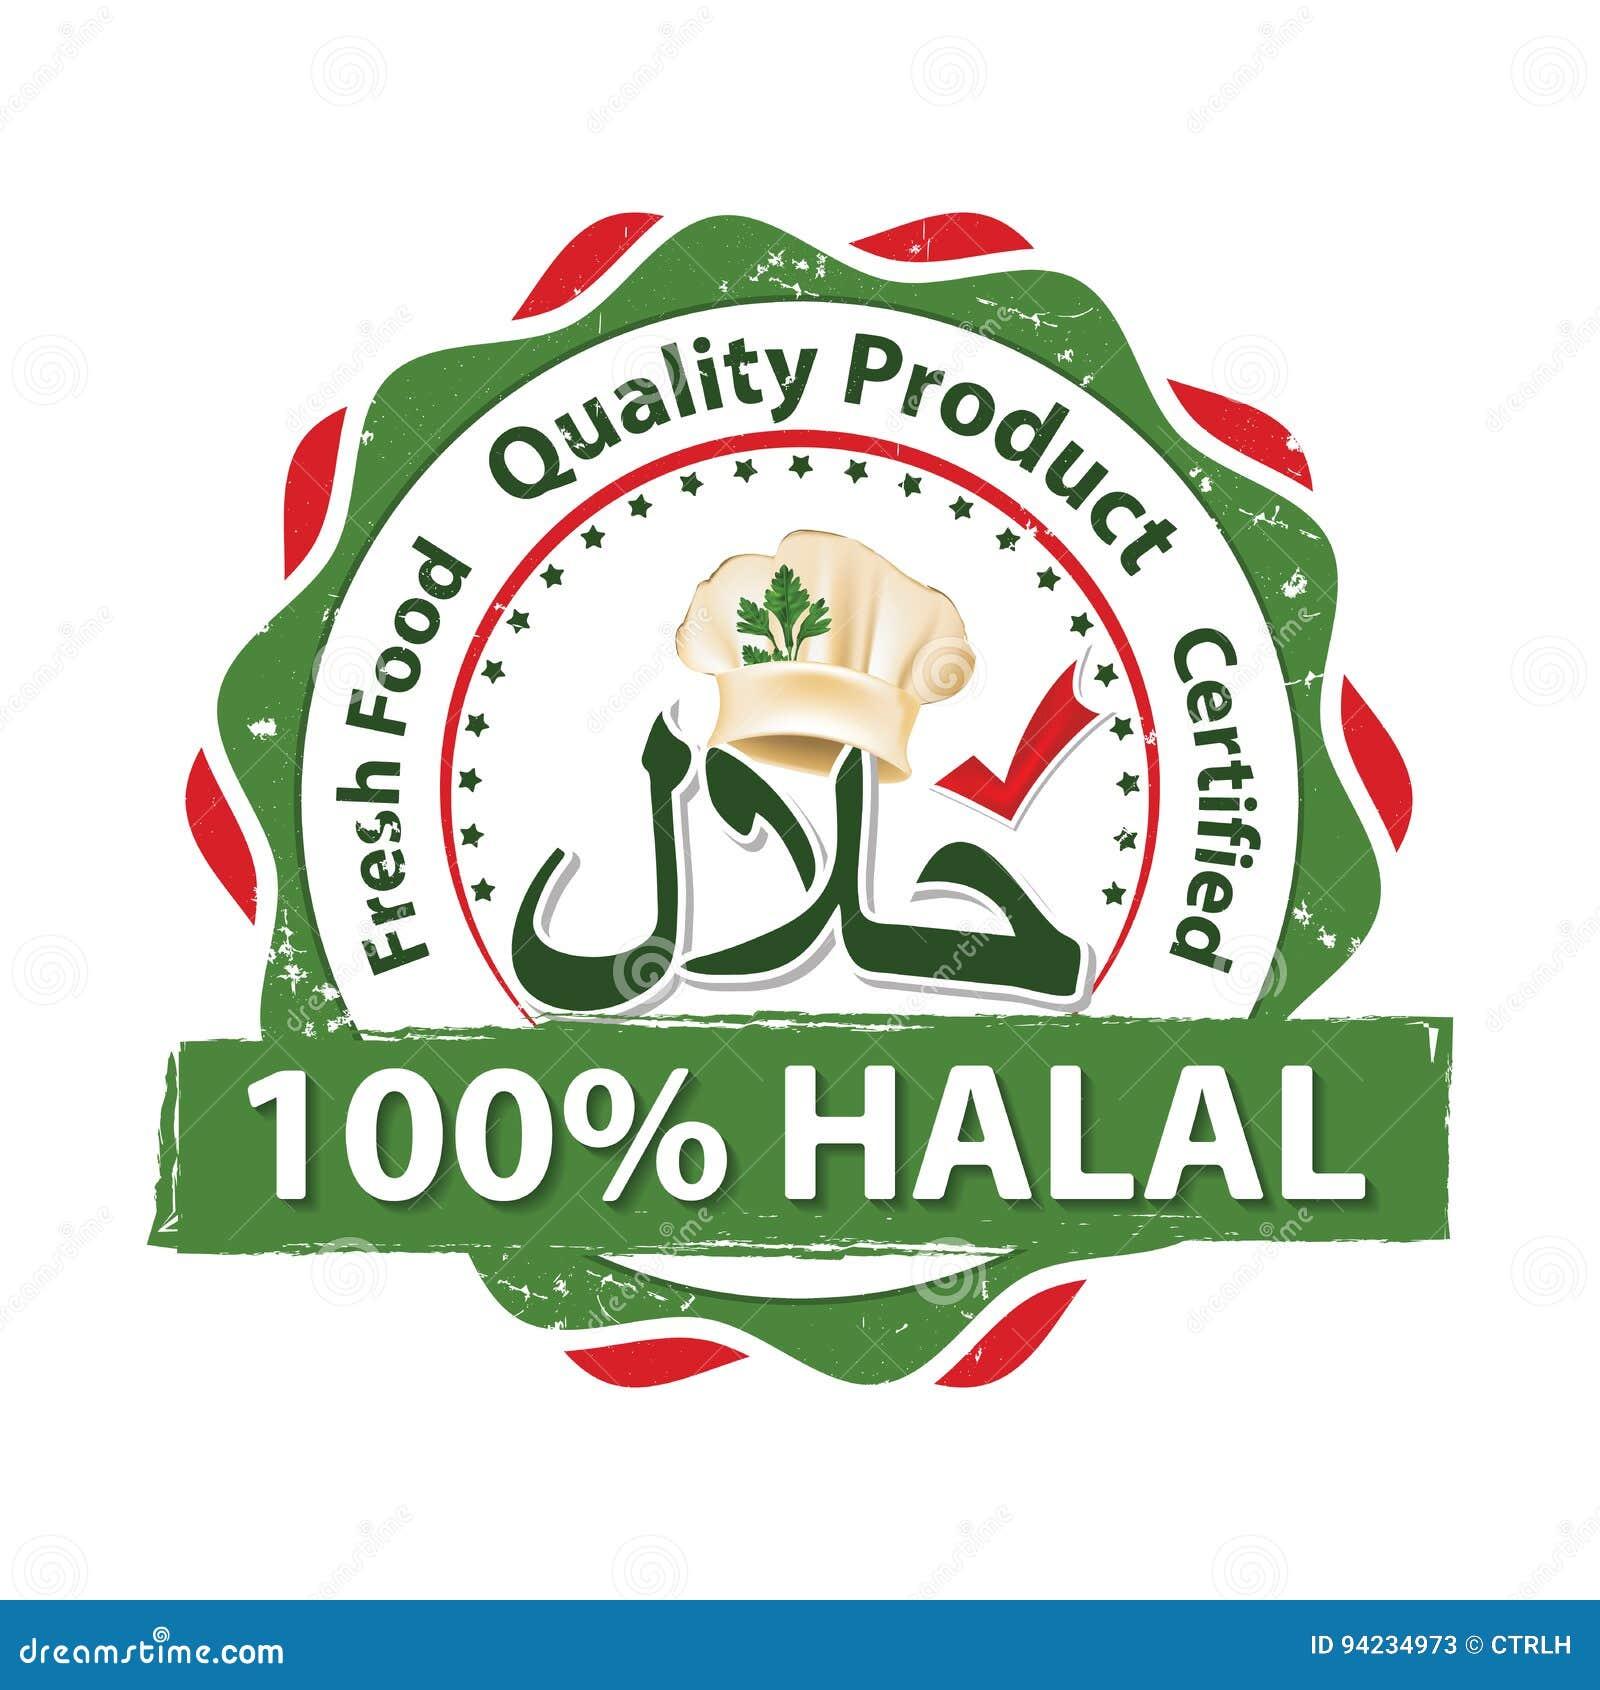 100 halal certified fresh food printable stamp label stock 100 halal certified fresh food printable stamp label stock photos buycottarizona